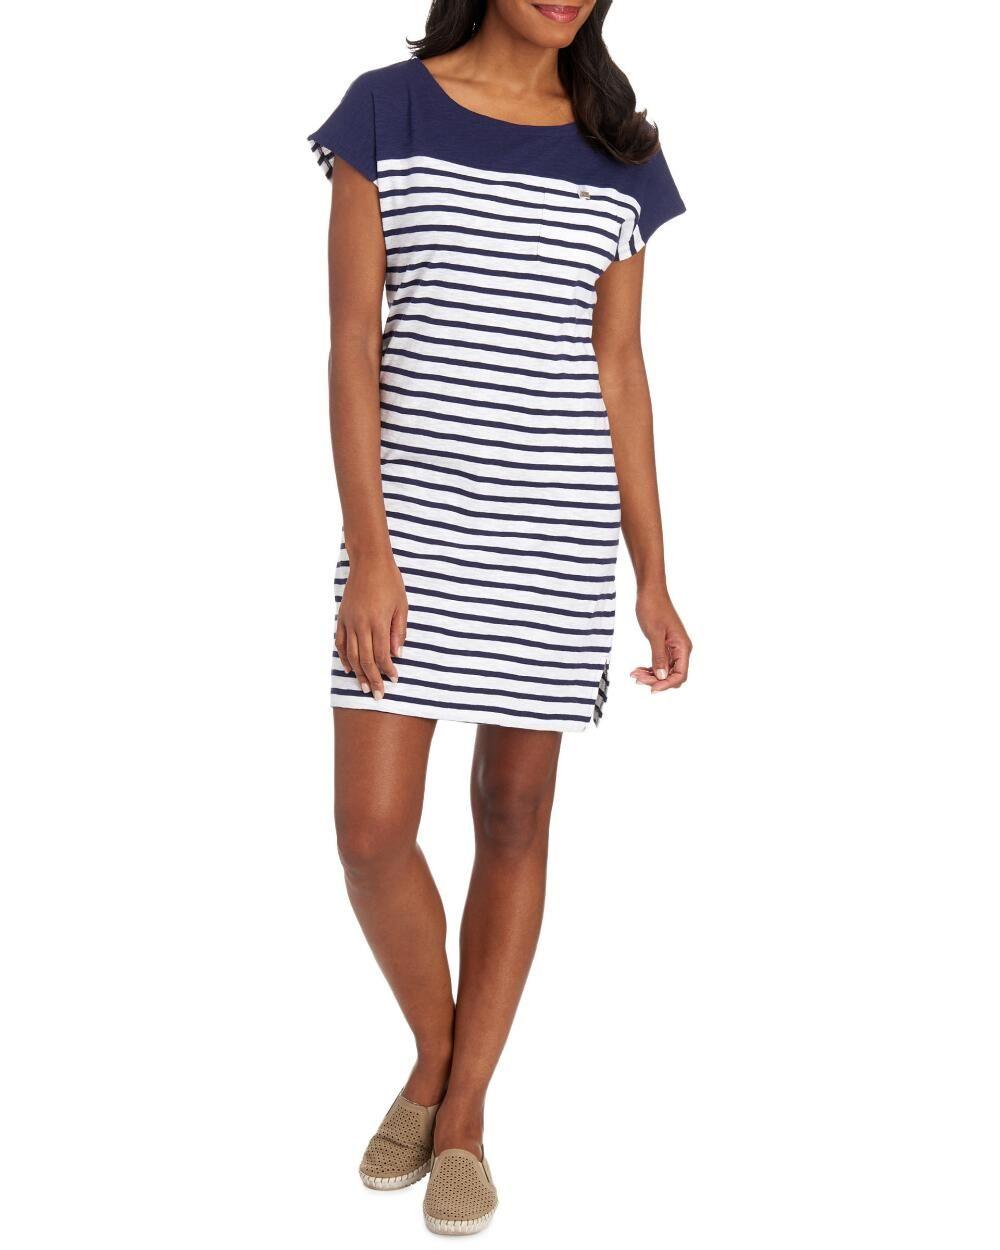 Pin By Peridot Pixies Studio On T Shirt Dresses T Shirt Dress Shirt Dress Striped T Shirt Dress [ 1250 x 1000 Pixel ]